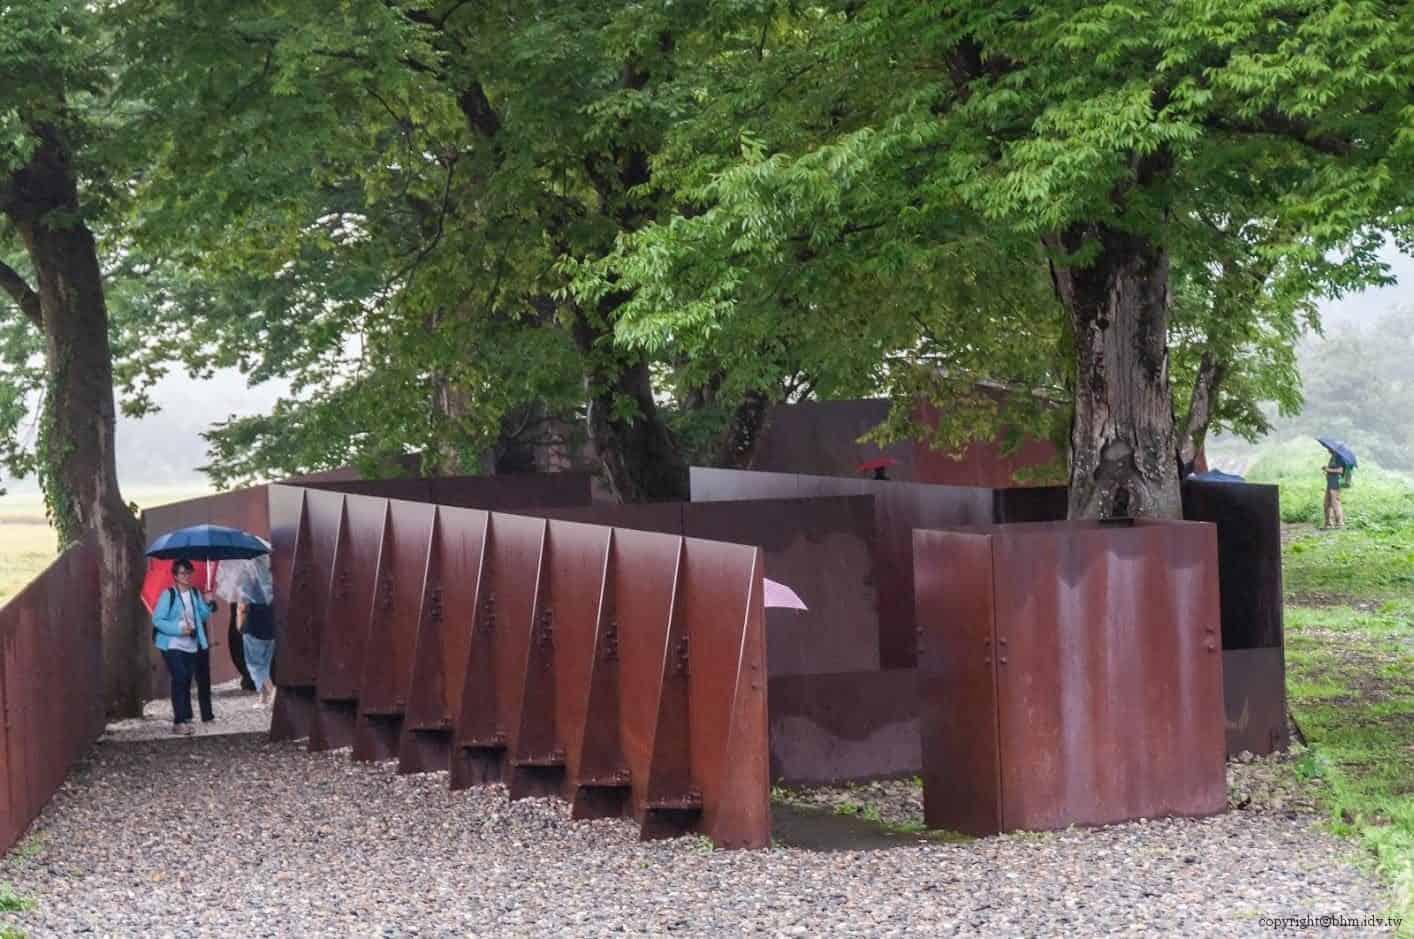 Casagrande&Rintala建築事務所,對峙的牆POTEMKIN,採用冰冷的不鏽鋼材表現明顯的空間阻隔 對峙的牆potemkin 對峙的牆POTEMKIN potemkin 01 0x0